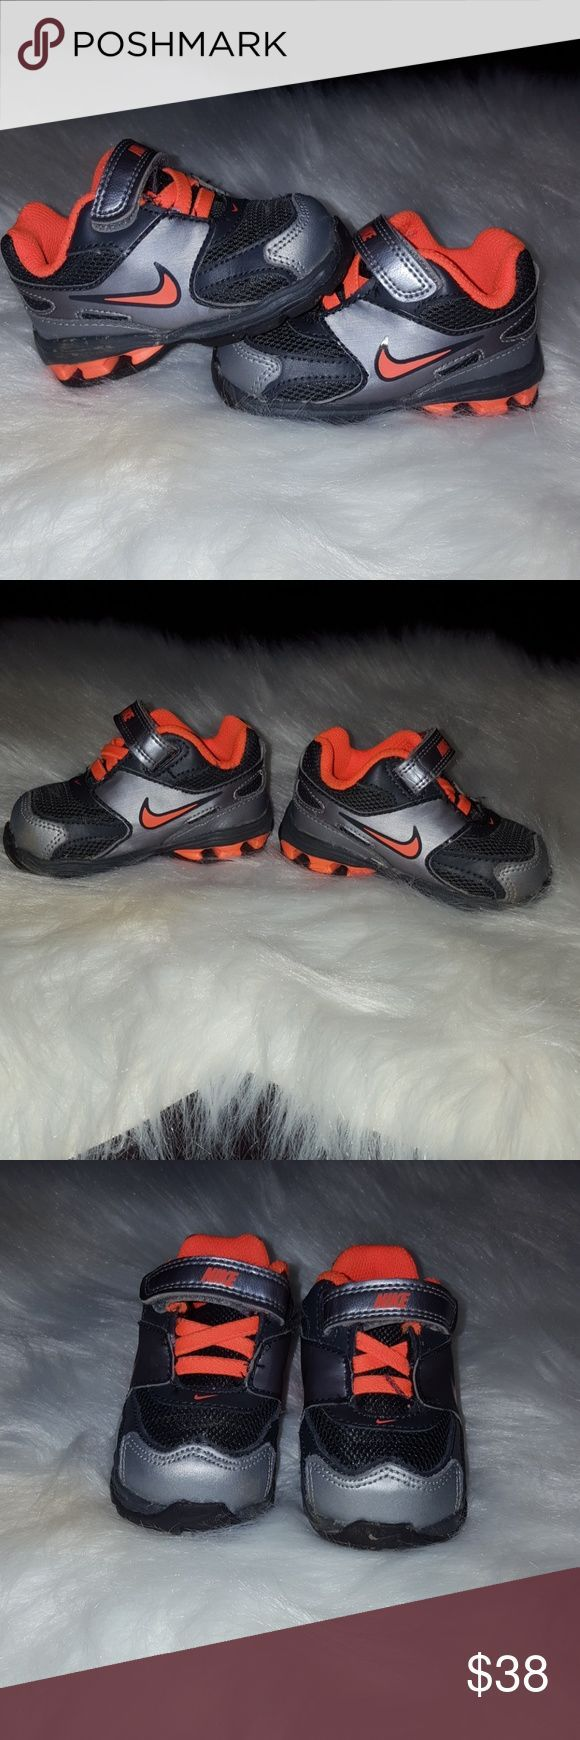 Baby boy Nike Reax size 4c EUC Baby boy